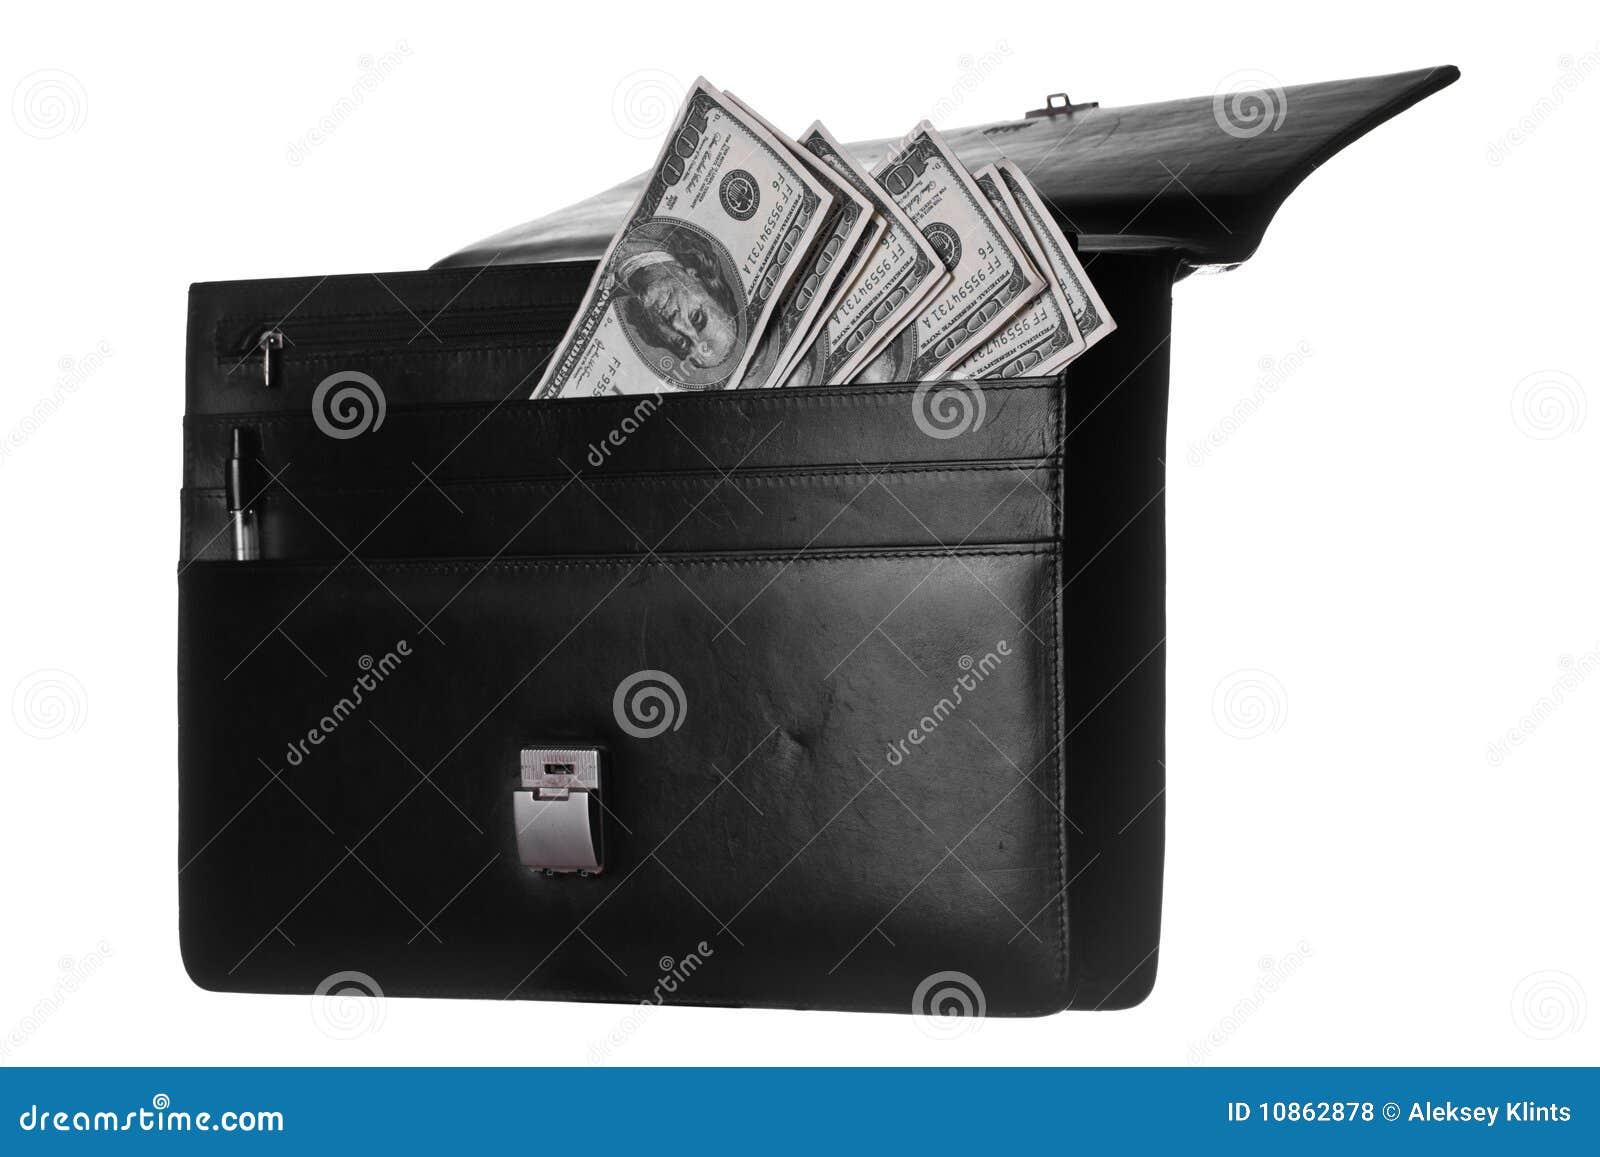 Dollars in attache